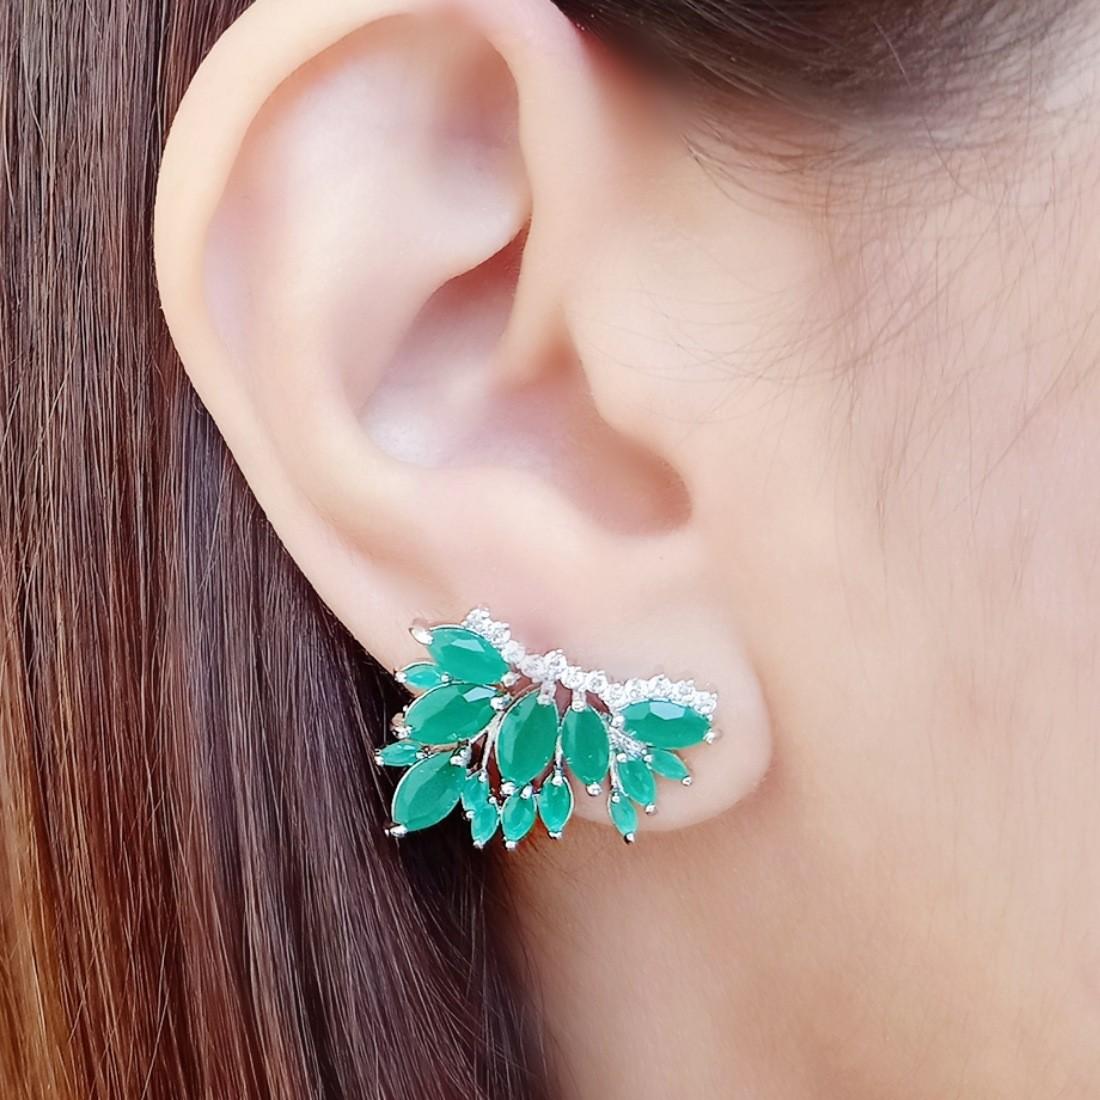 Ear Cuff Prata Esmeralda Leitosa com Micro Zircônia Cristal Semijoia em Ródio Branco  - Soloyou